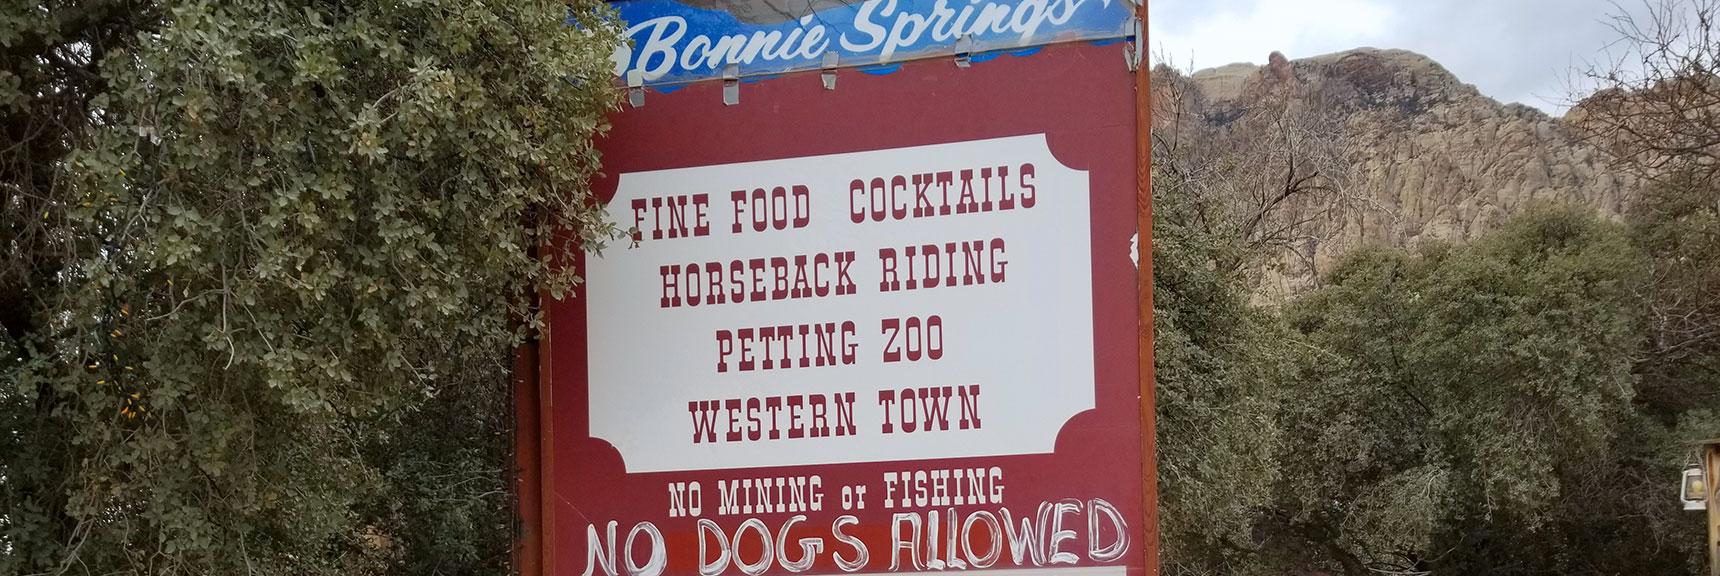 Amenities at Bonnie Springs Ranch, Nevada